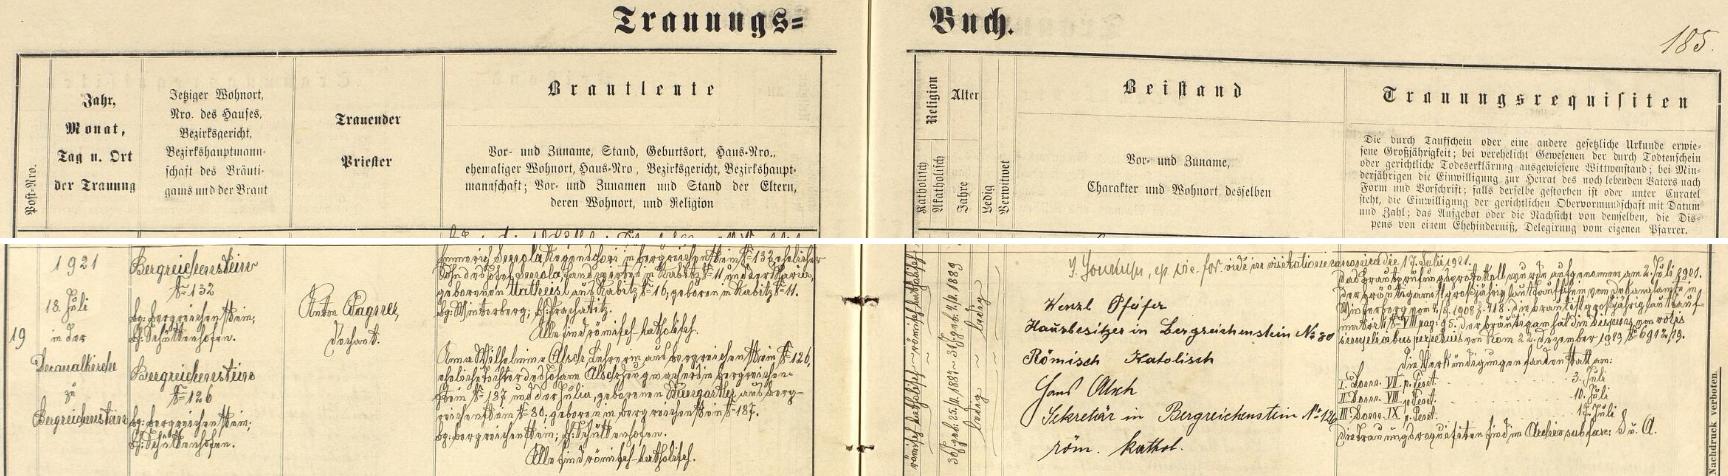 Záznam kašperskohorské matriky o svatbě jeho rodičů